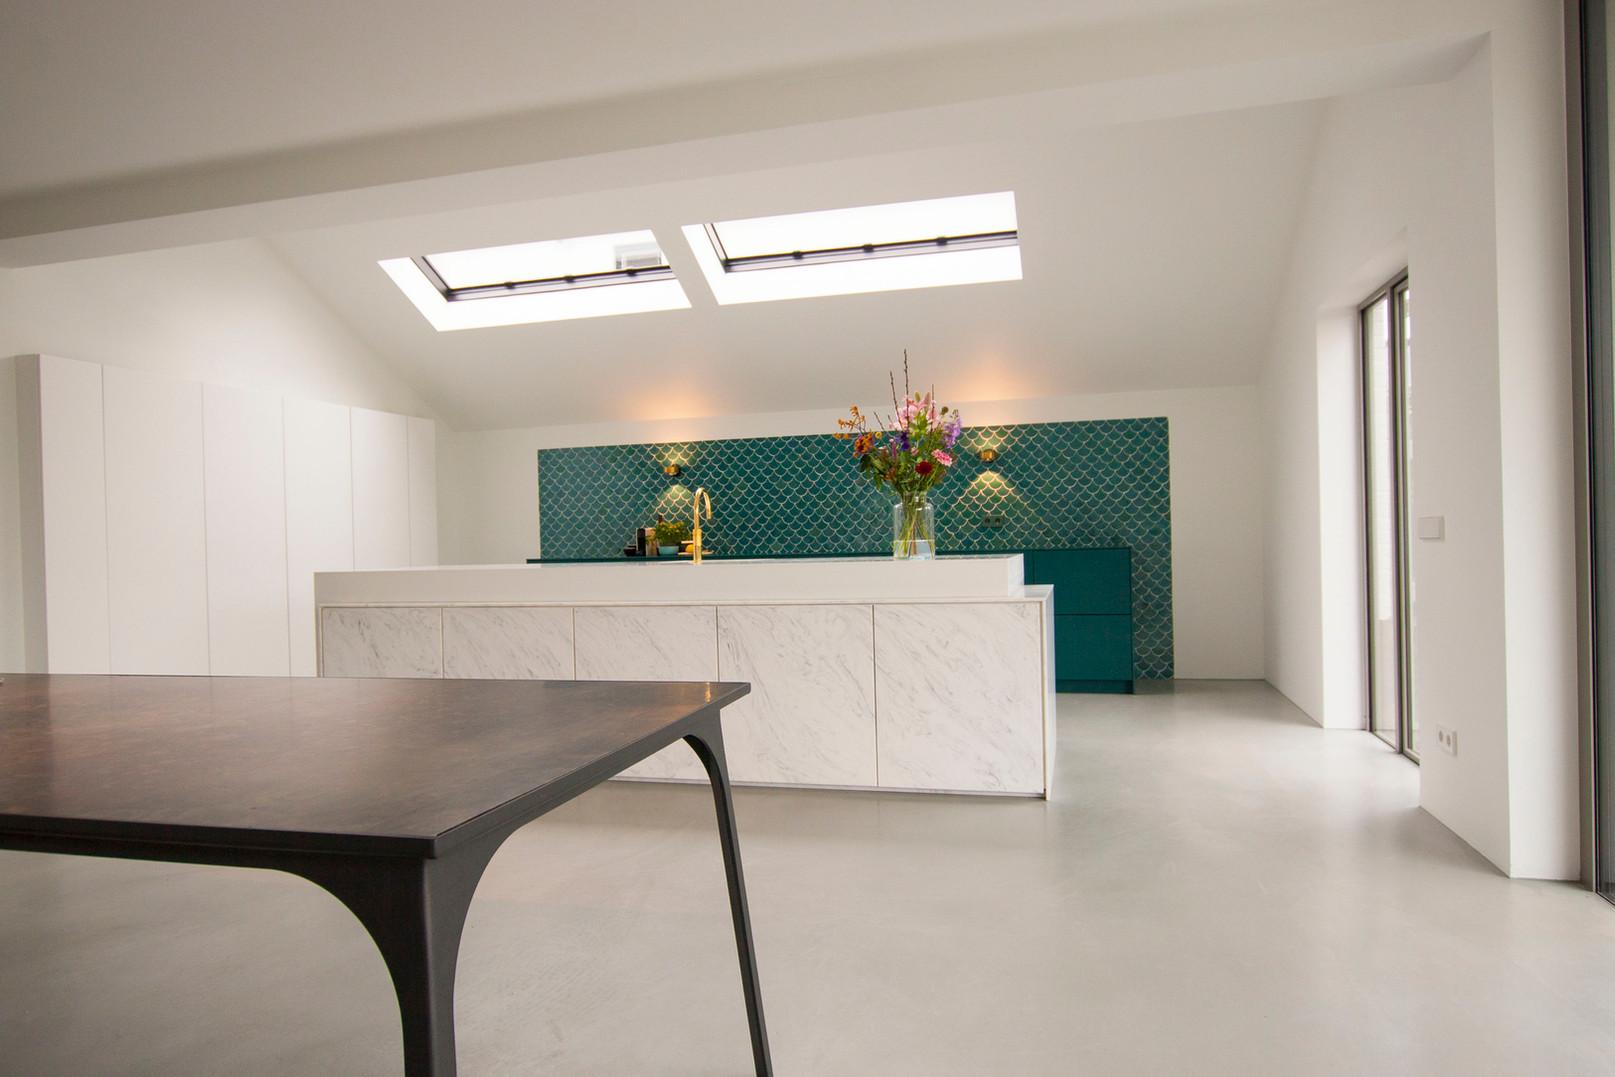 Kitchen solid surface - Atelier Ruben van Megen